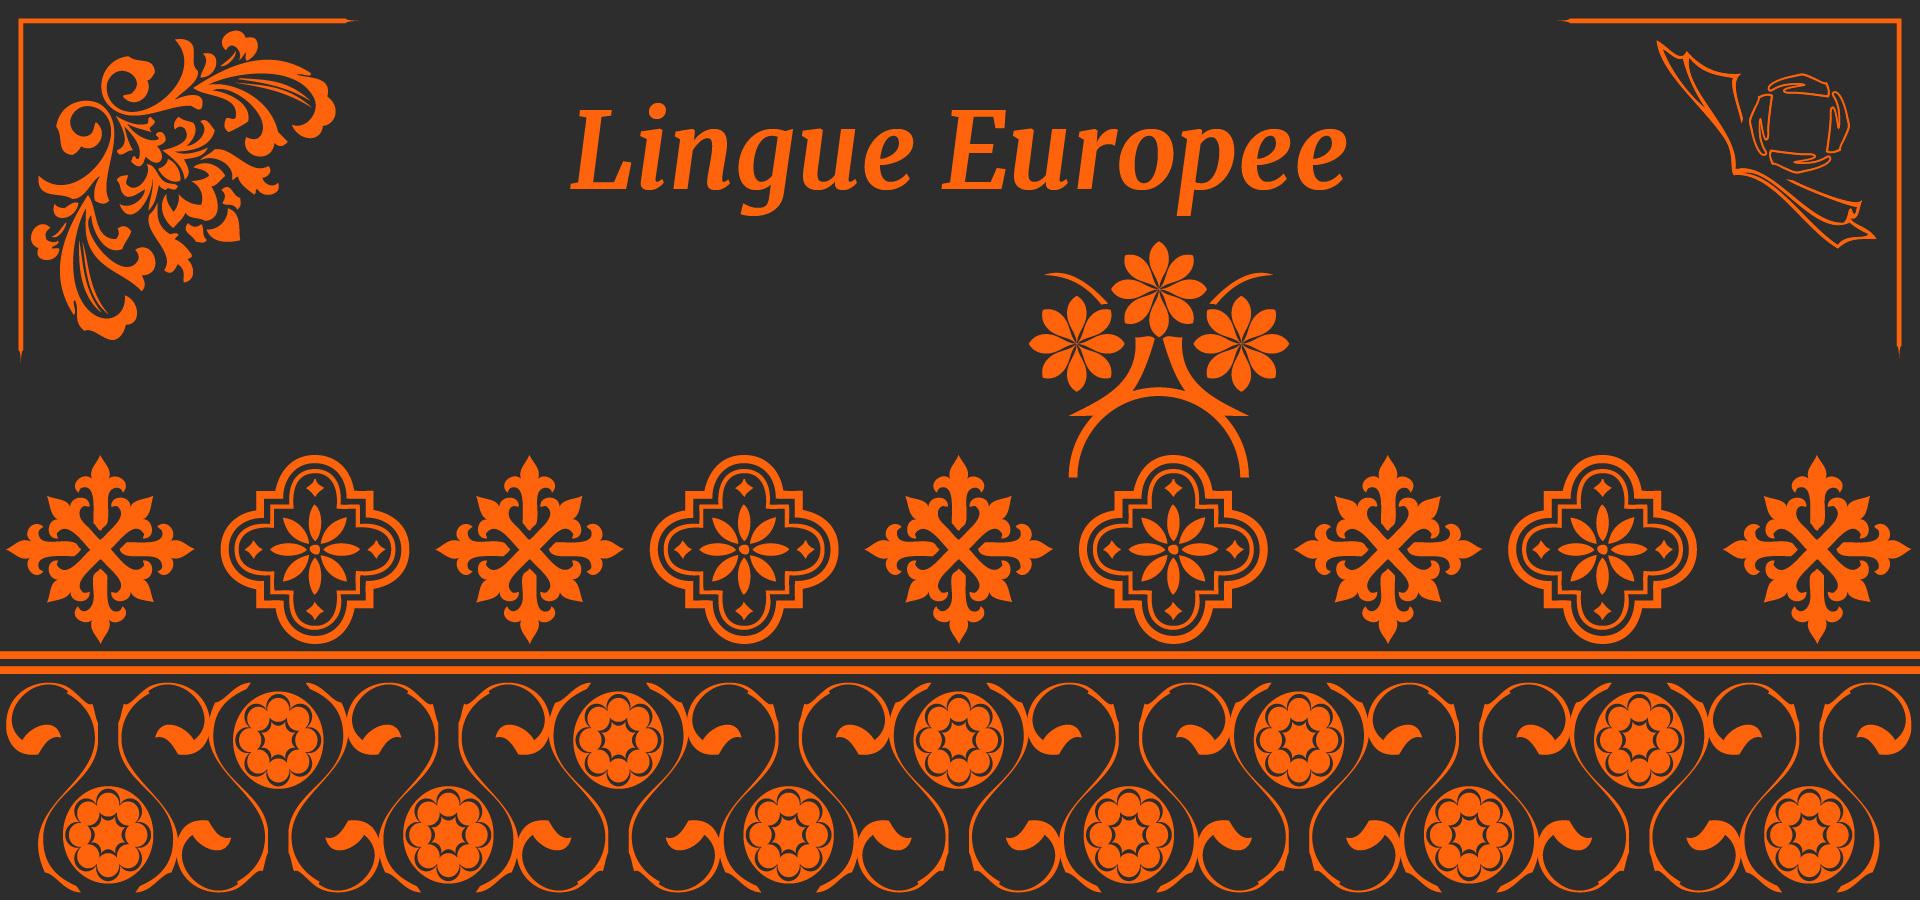 lingue europee alif pisa